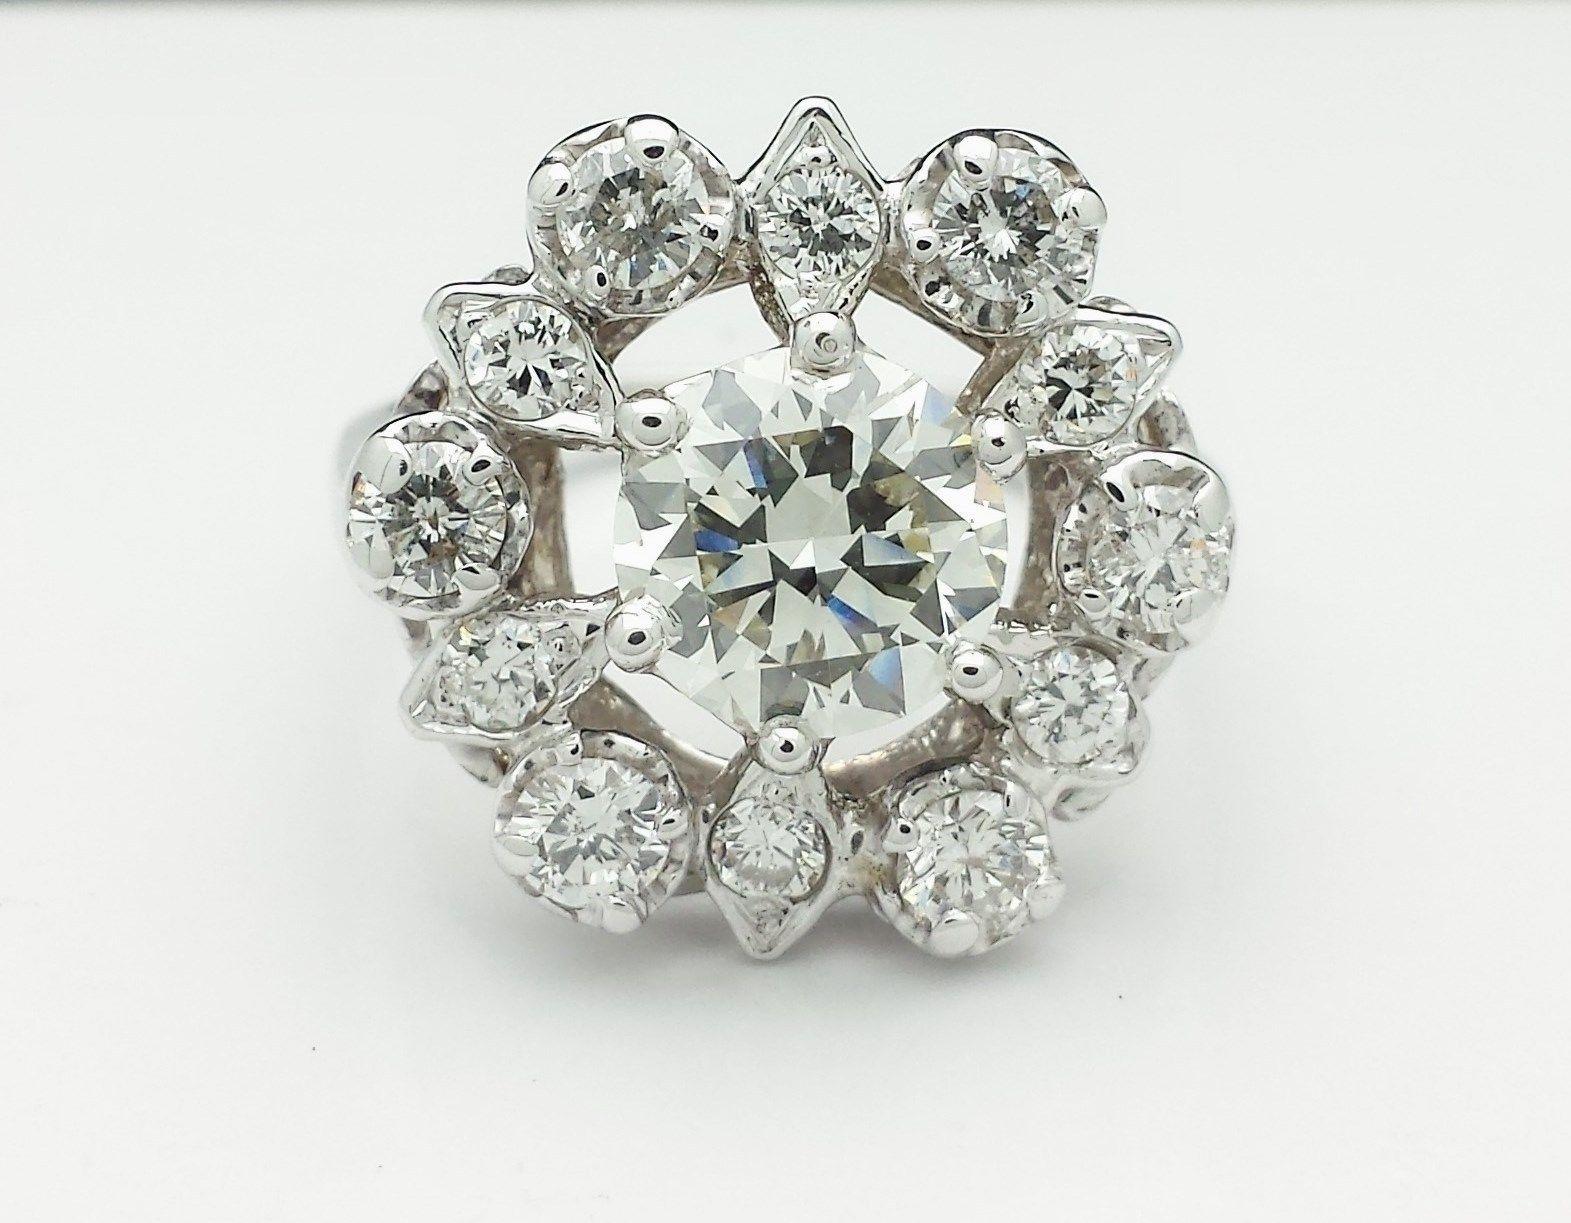 Stunning 1 5 Carat VS2 Diamond Engagement Ring 14k White Gold Estate